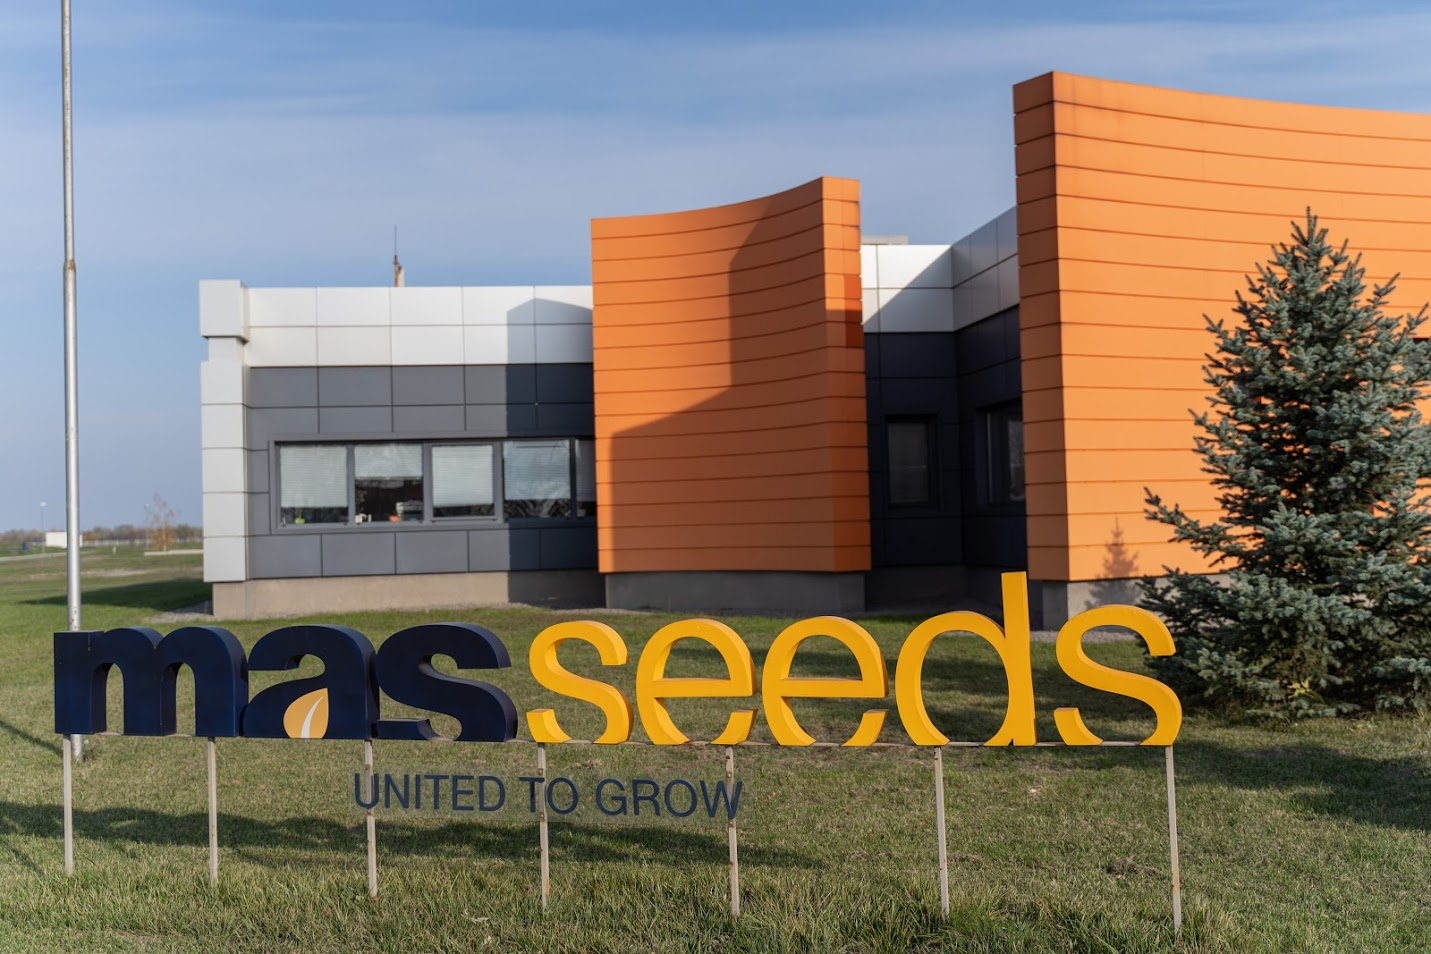 mas_seeds.JPG (293 KB)